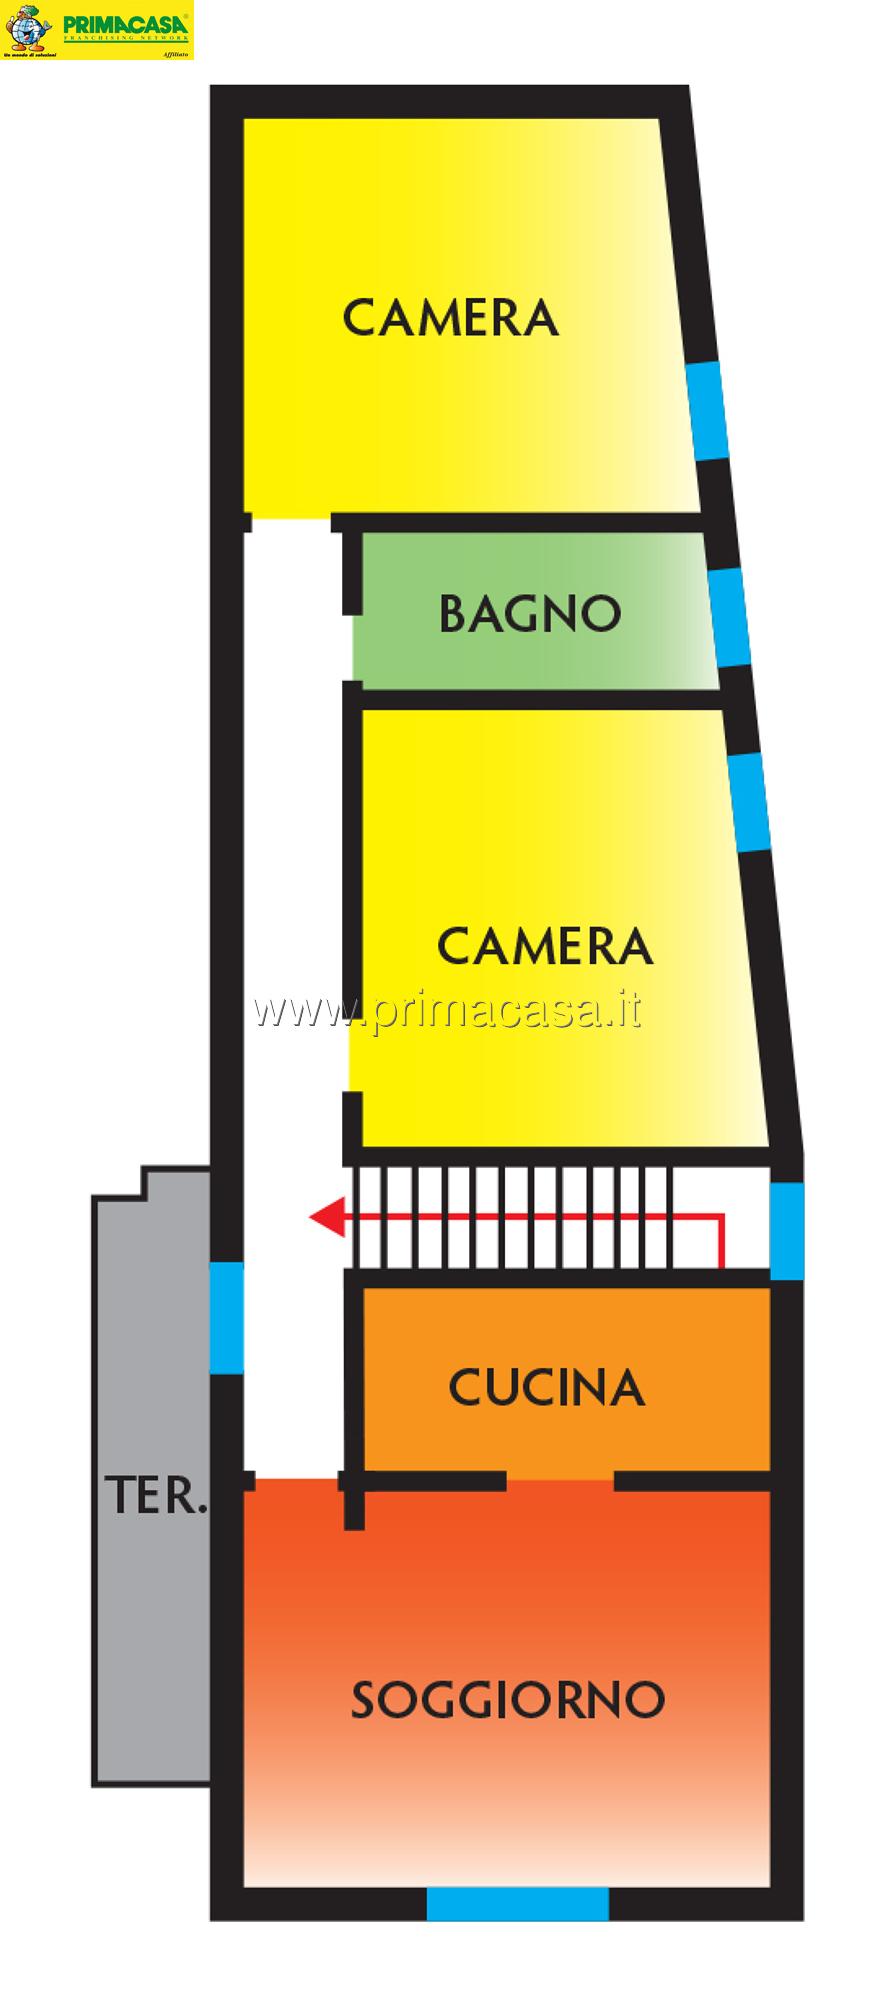 Quadrilocale in vendita - 110 mq